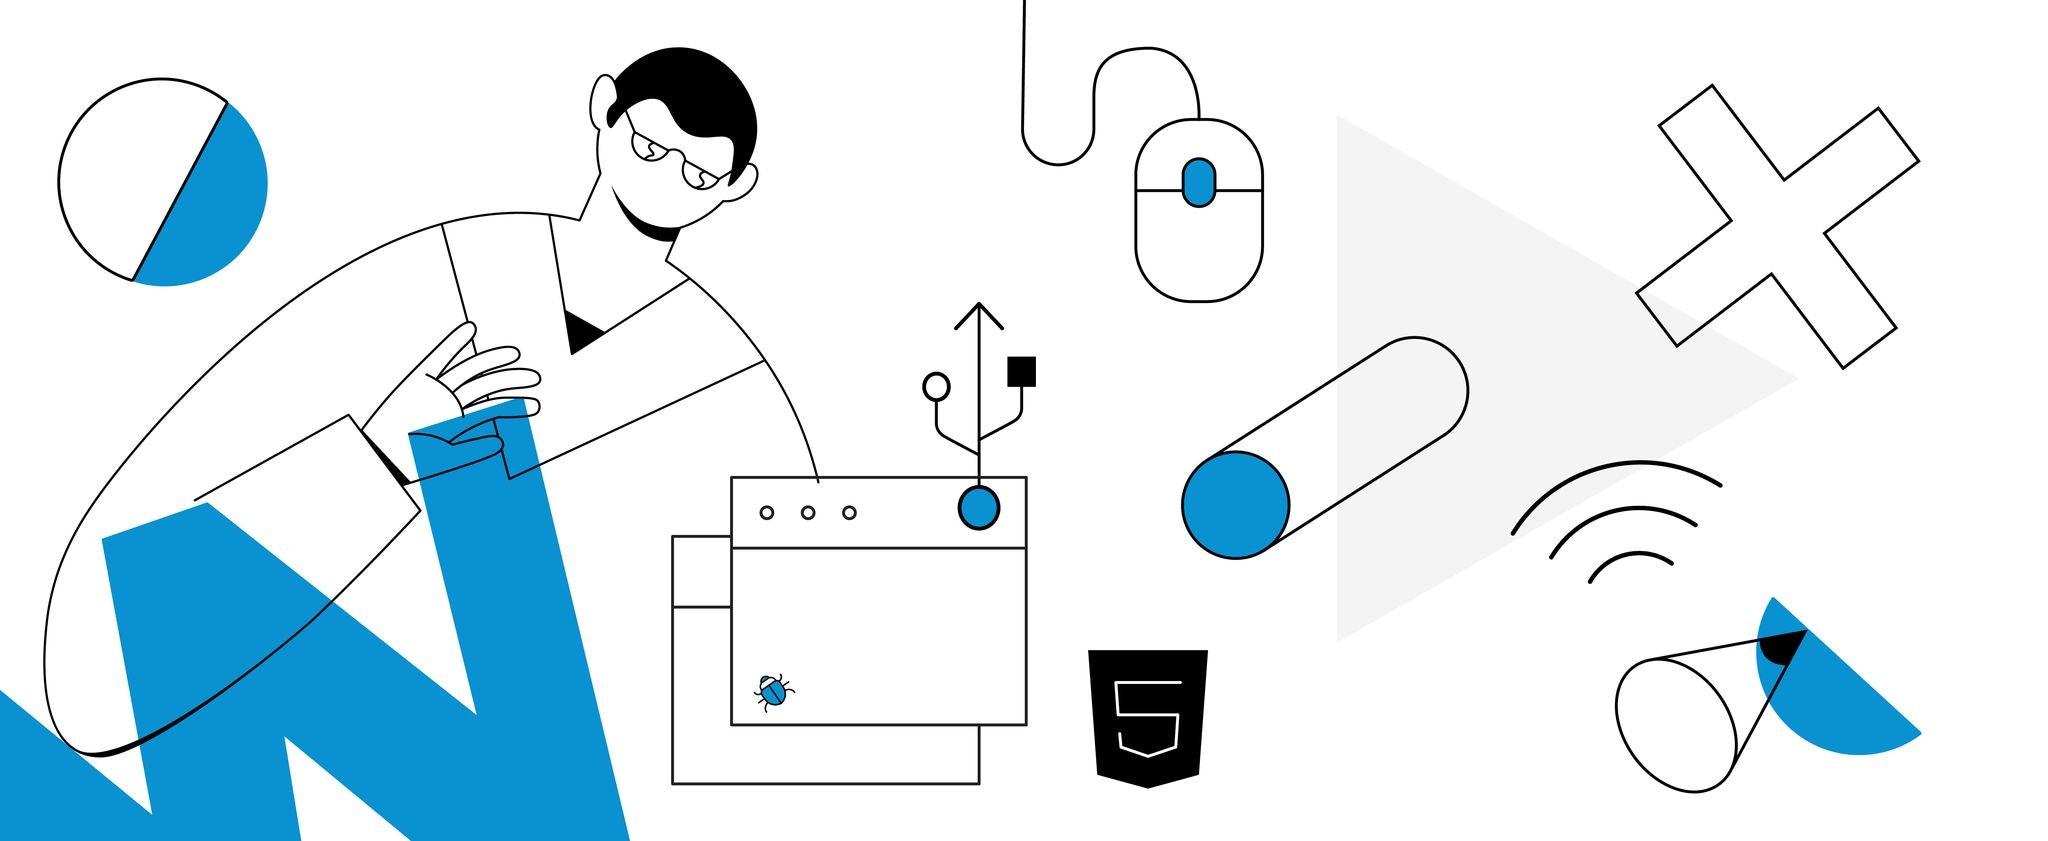 Trainee Softwareentwicklung.